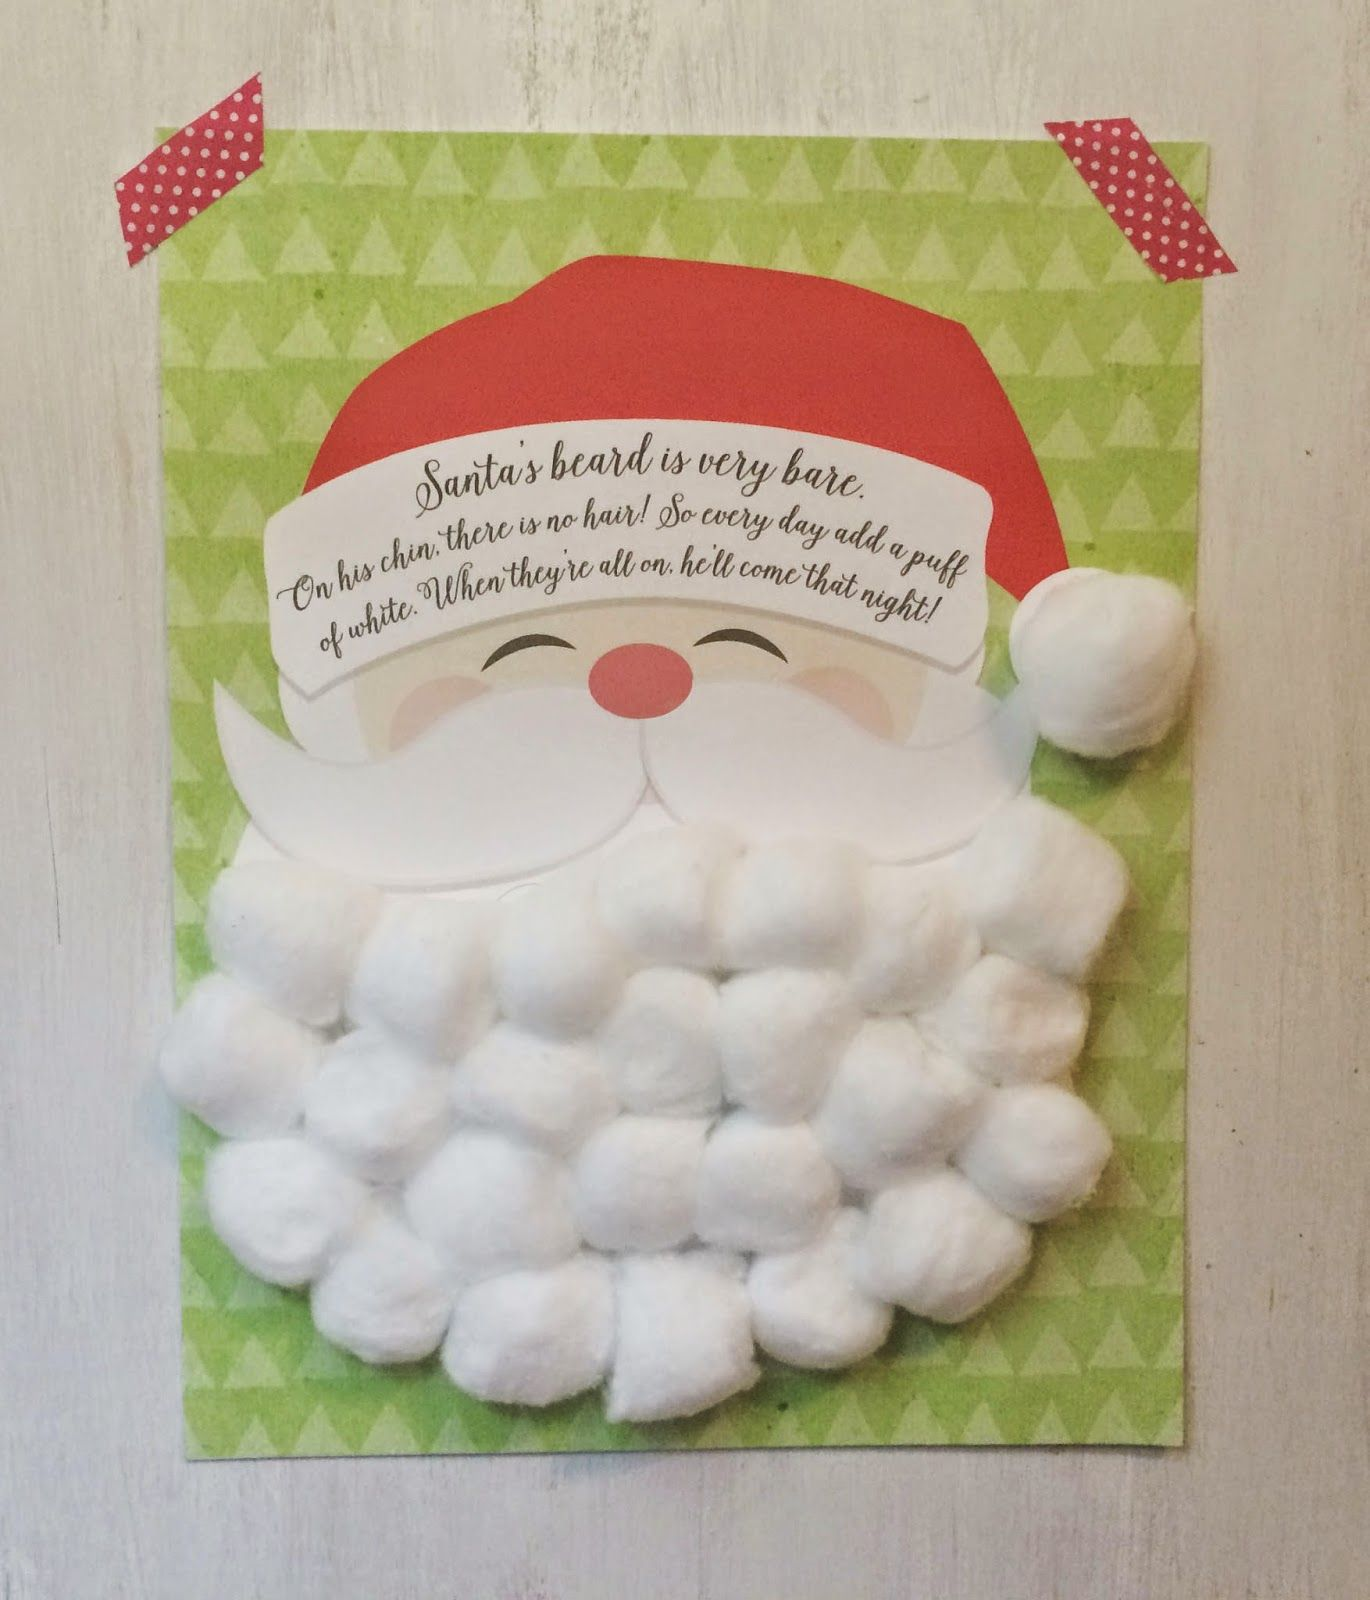 Free Printable} Santa Claus Beard Countdown Calendar | Christmas countdown calendar, Christmas countdown printable, Santa claus crafts